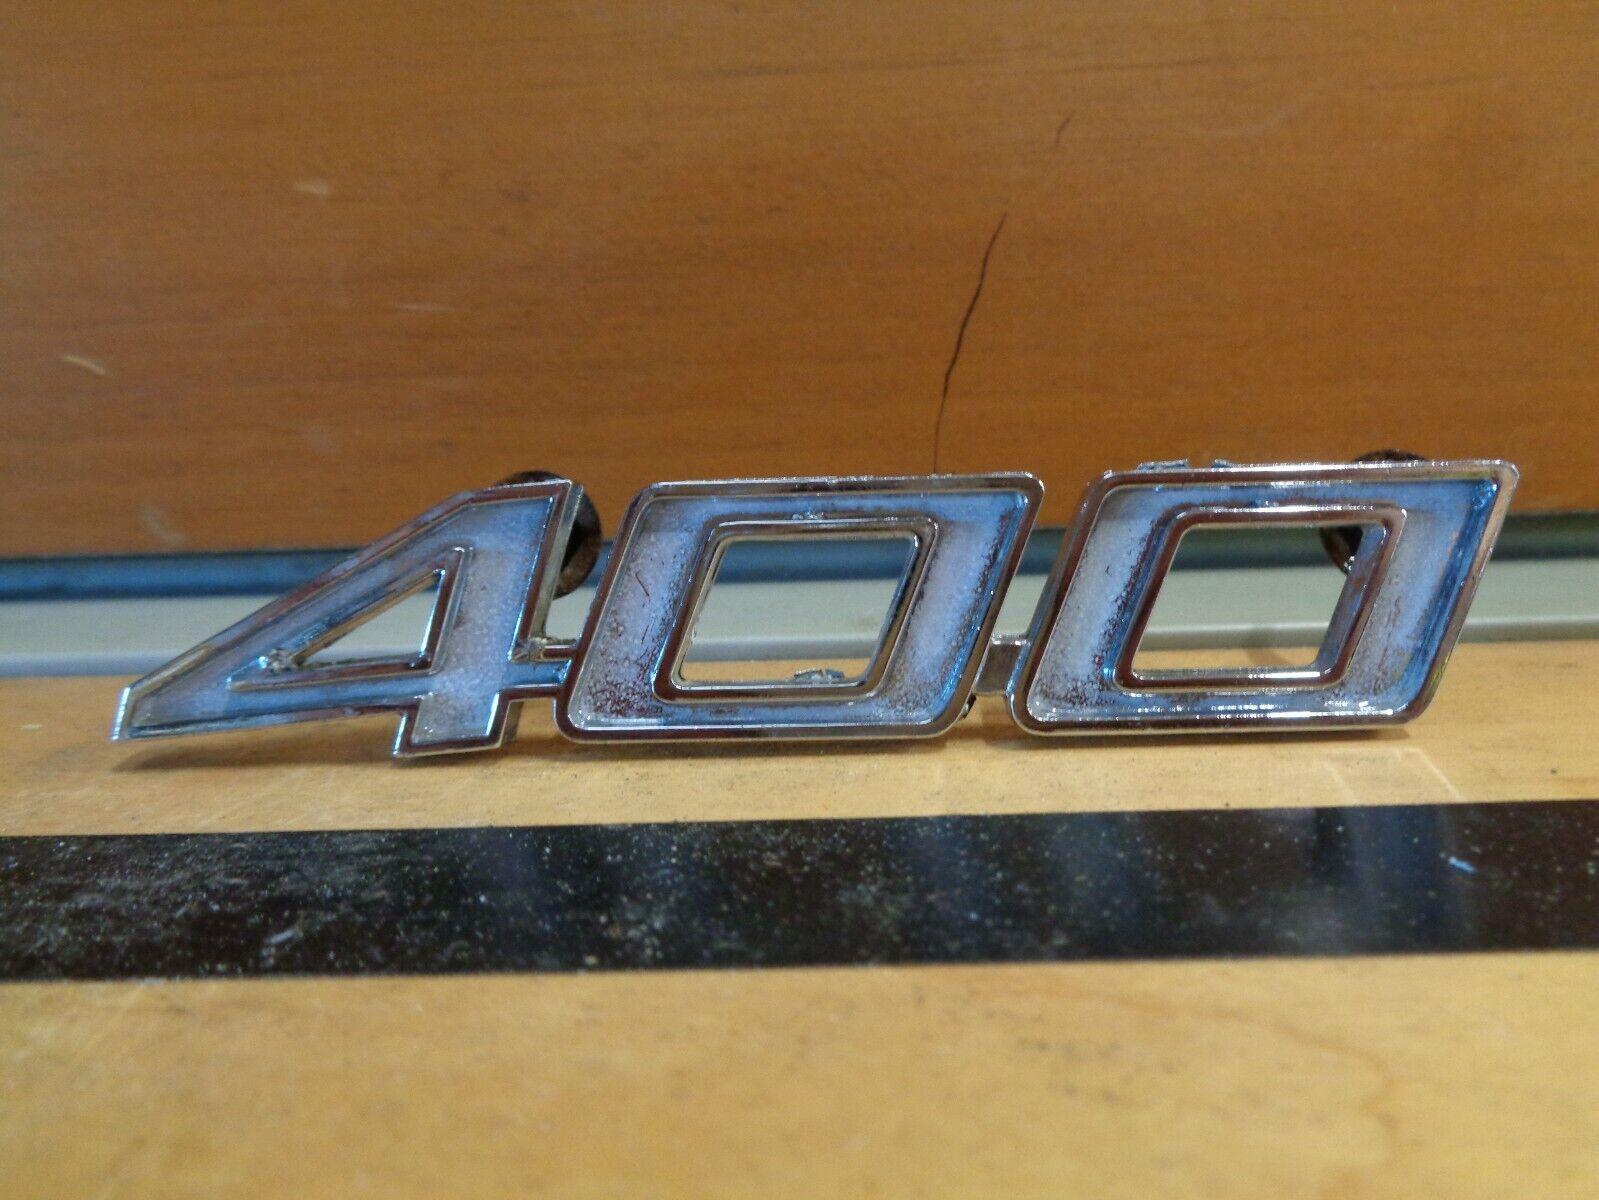 1 PAIR 1970-1974 Chevrolet Chevelle Impala 400 Fender Emblems Right & Left hand